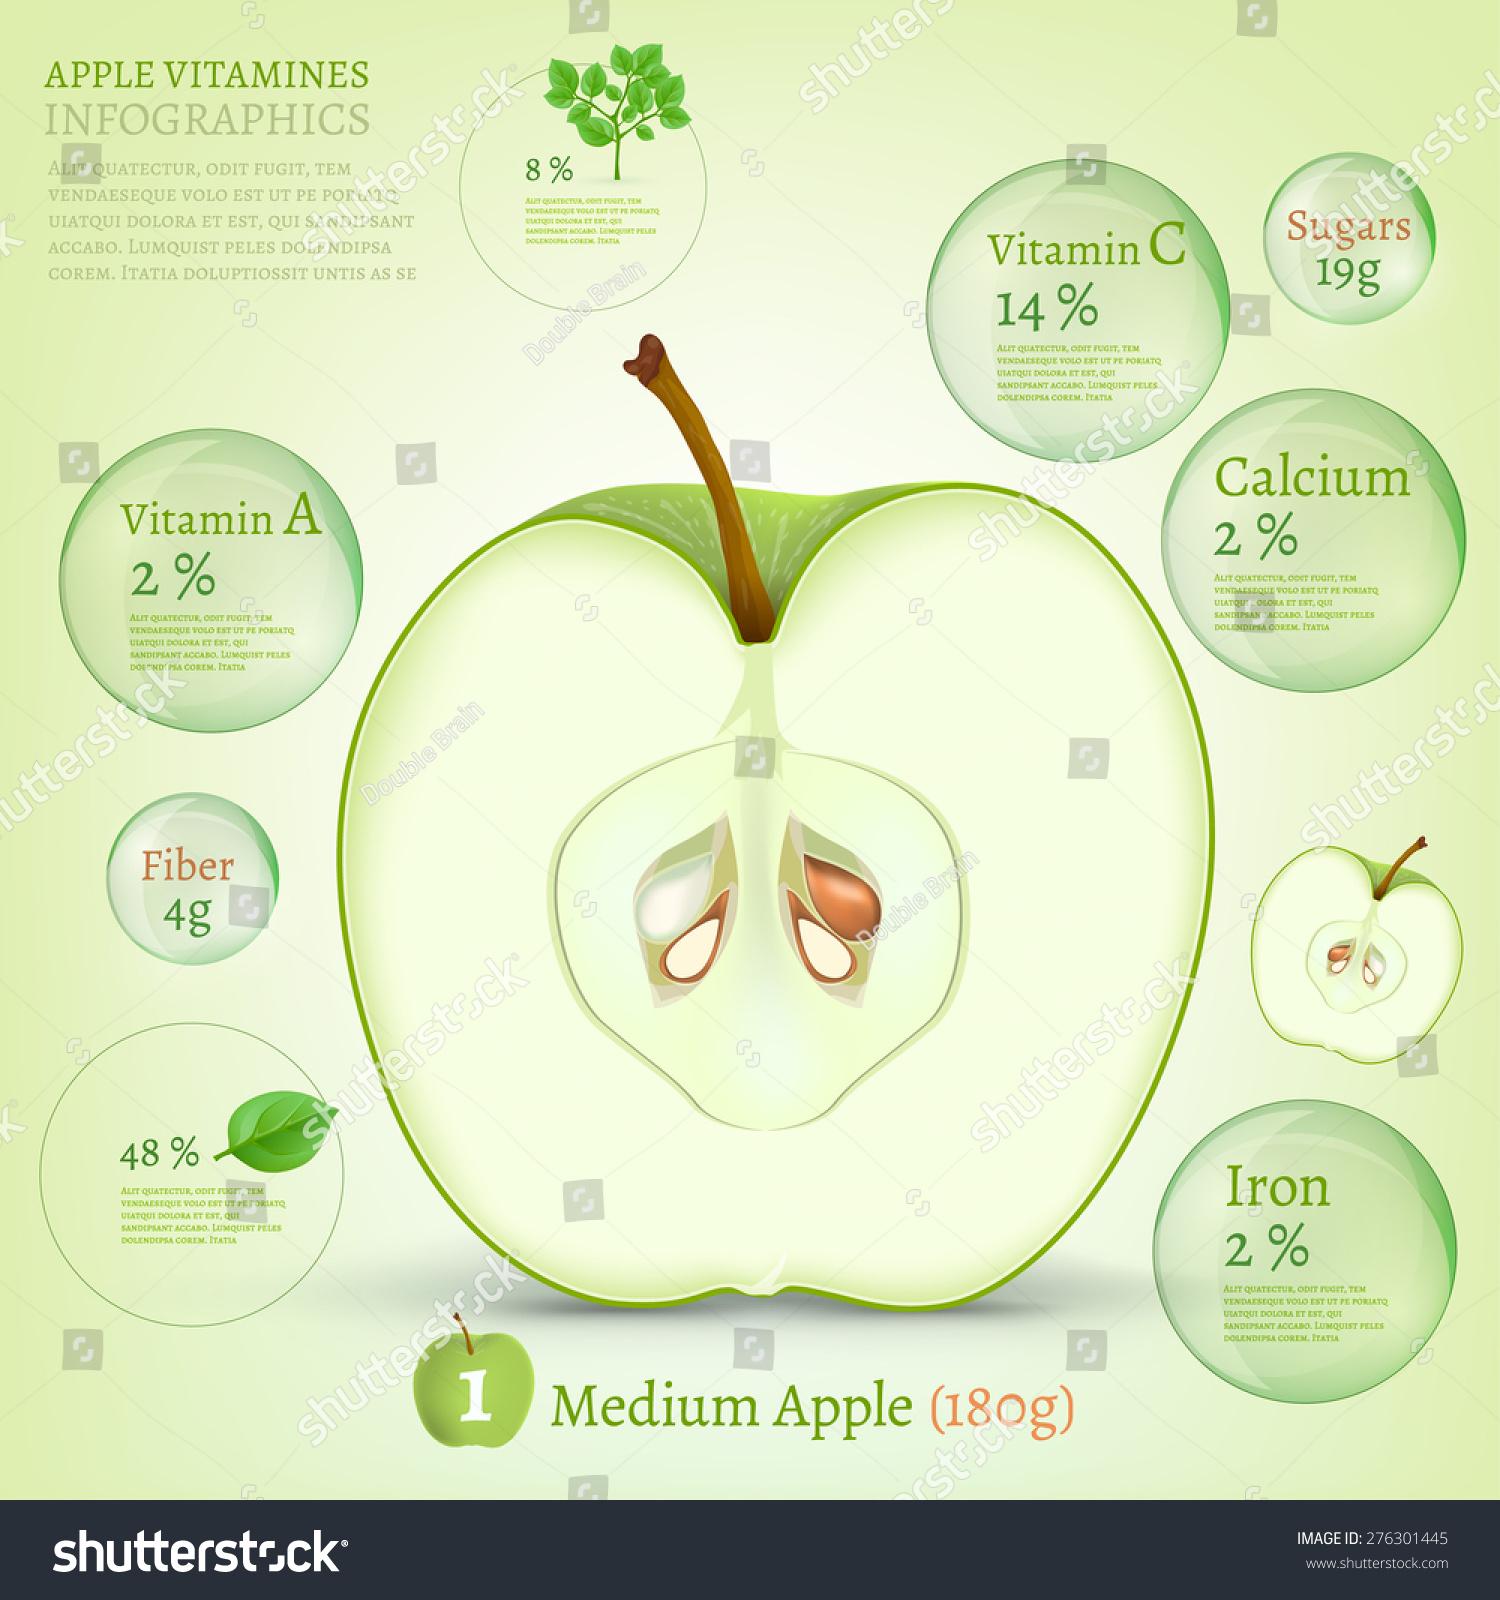 Apple Vitamine Infographic Vector Illustration Useful Stock Vector ...